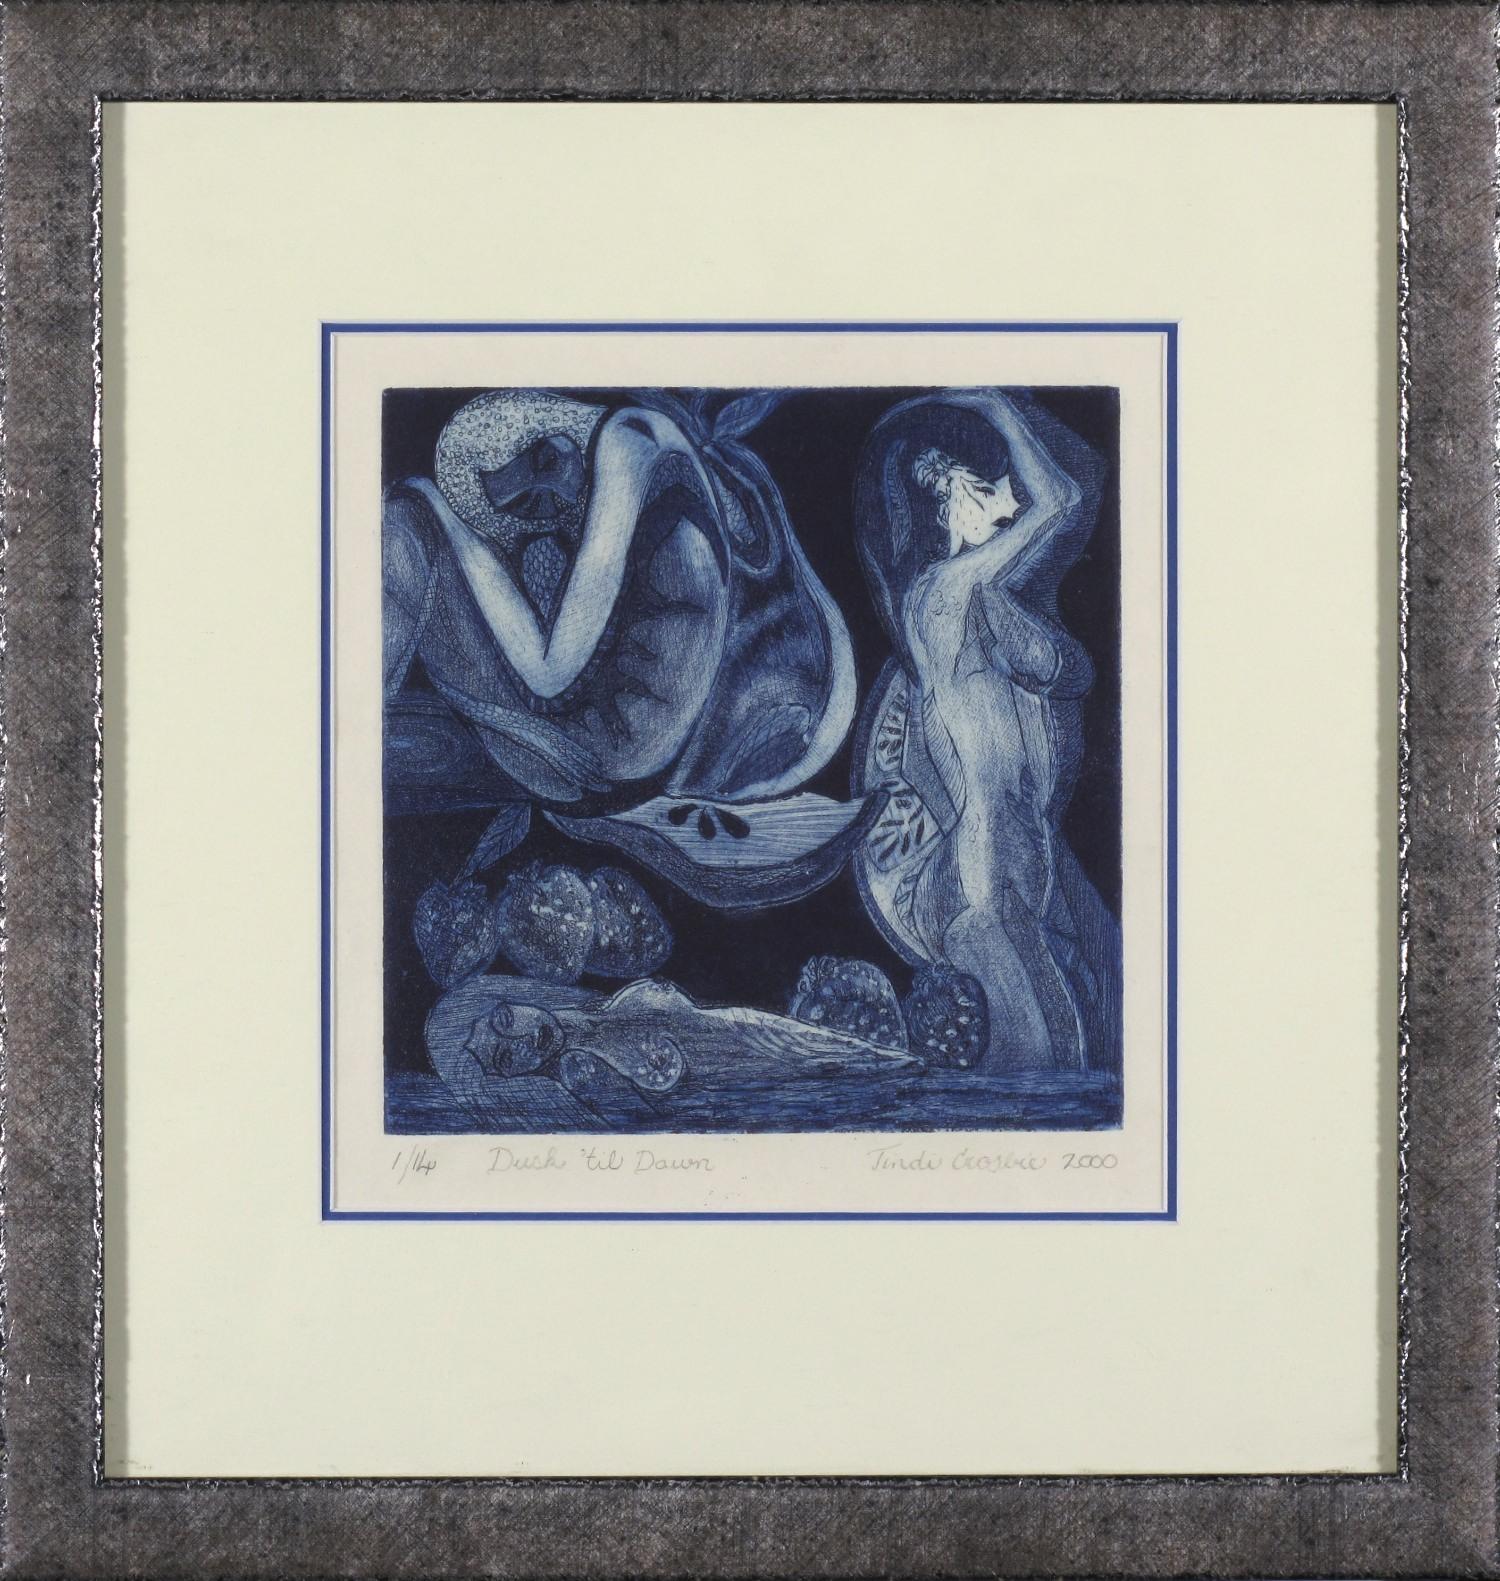 #1457. Tindi Crosbie. Dusk til Dawn. Limited Edition 43cm x 41cm. Signed Limited Edition 1-14 Was $380 Now $190